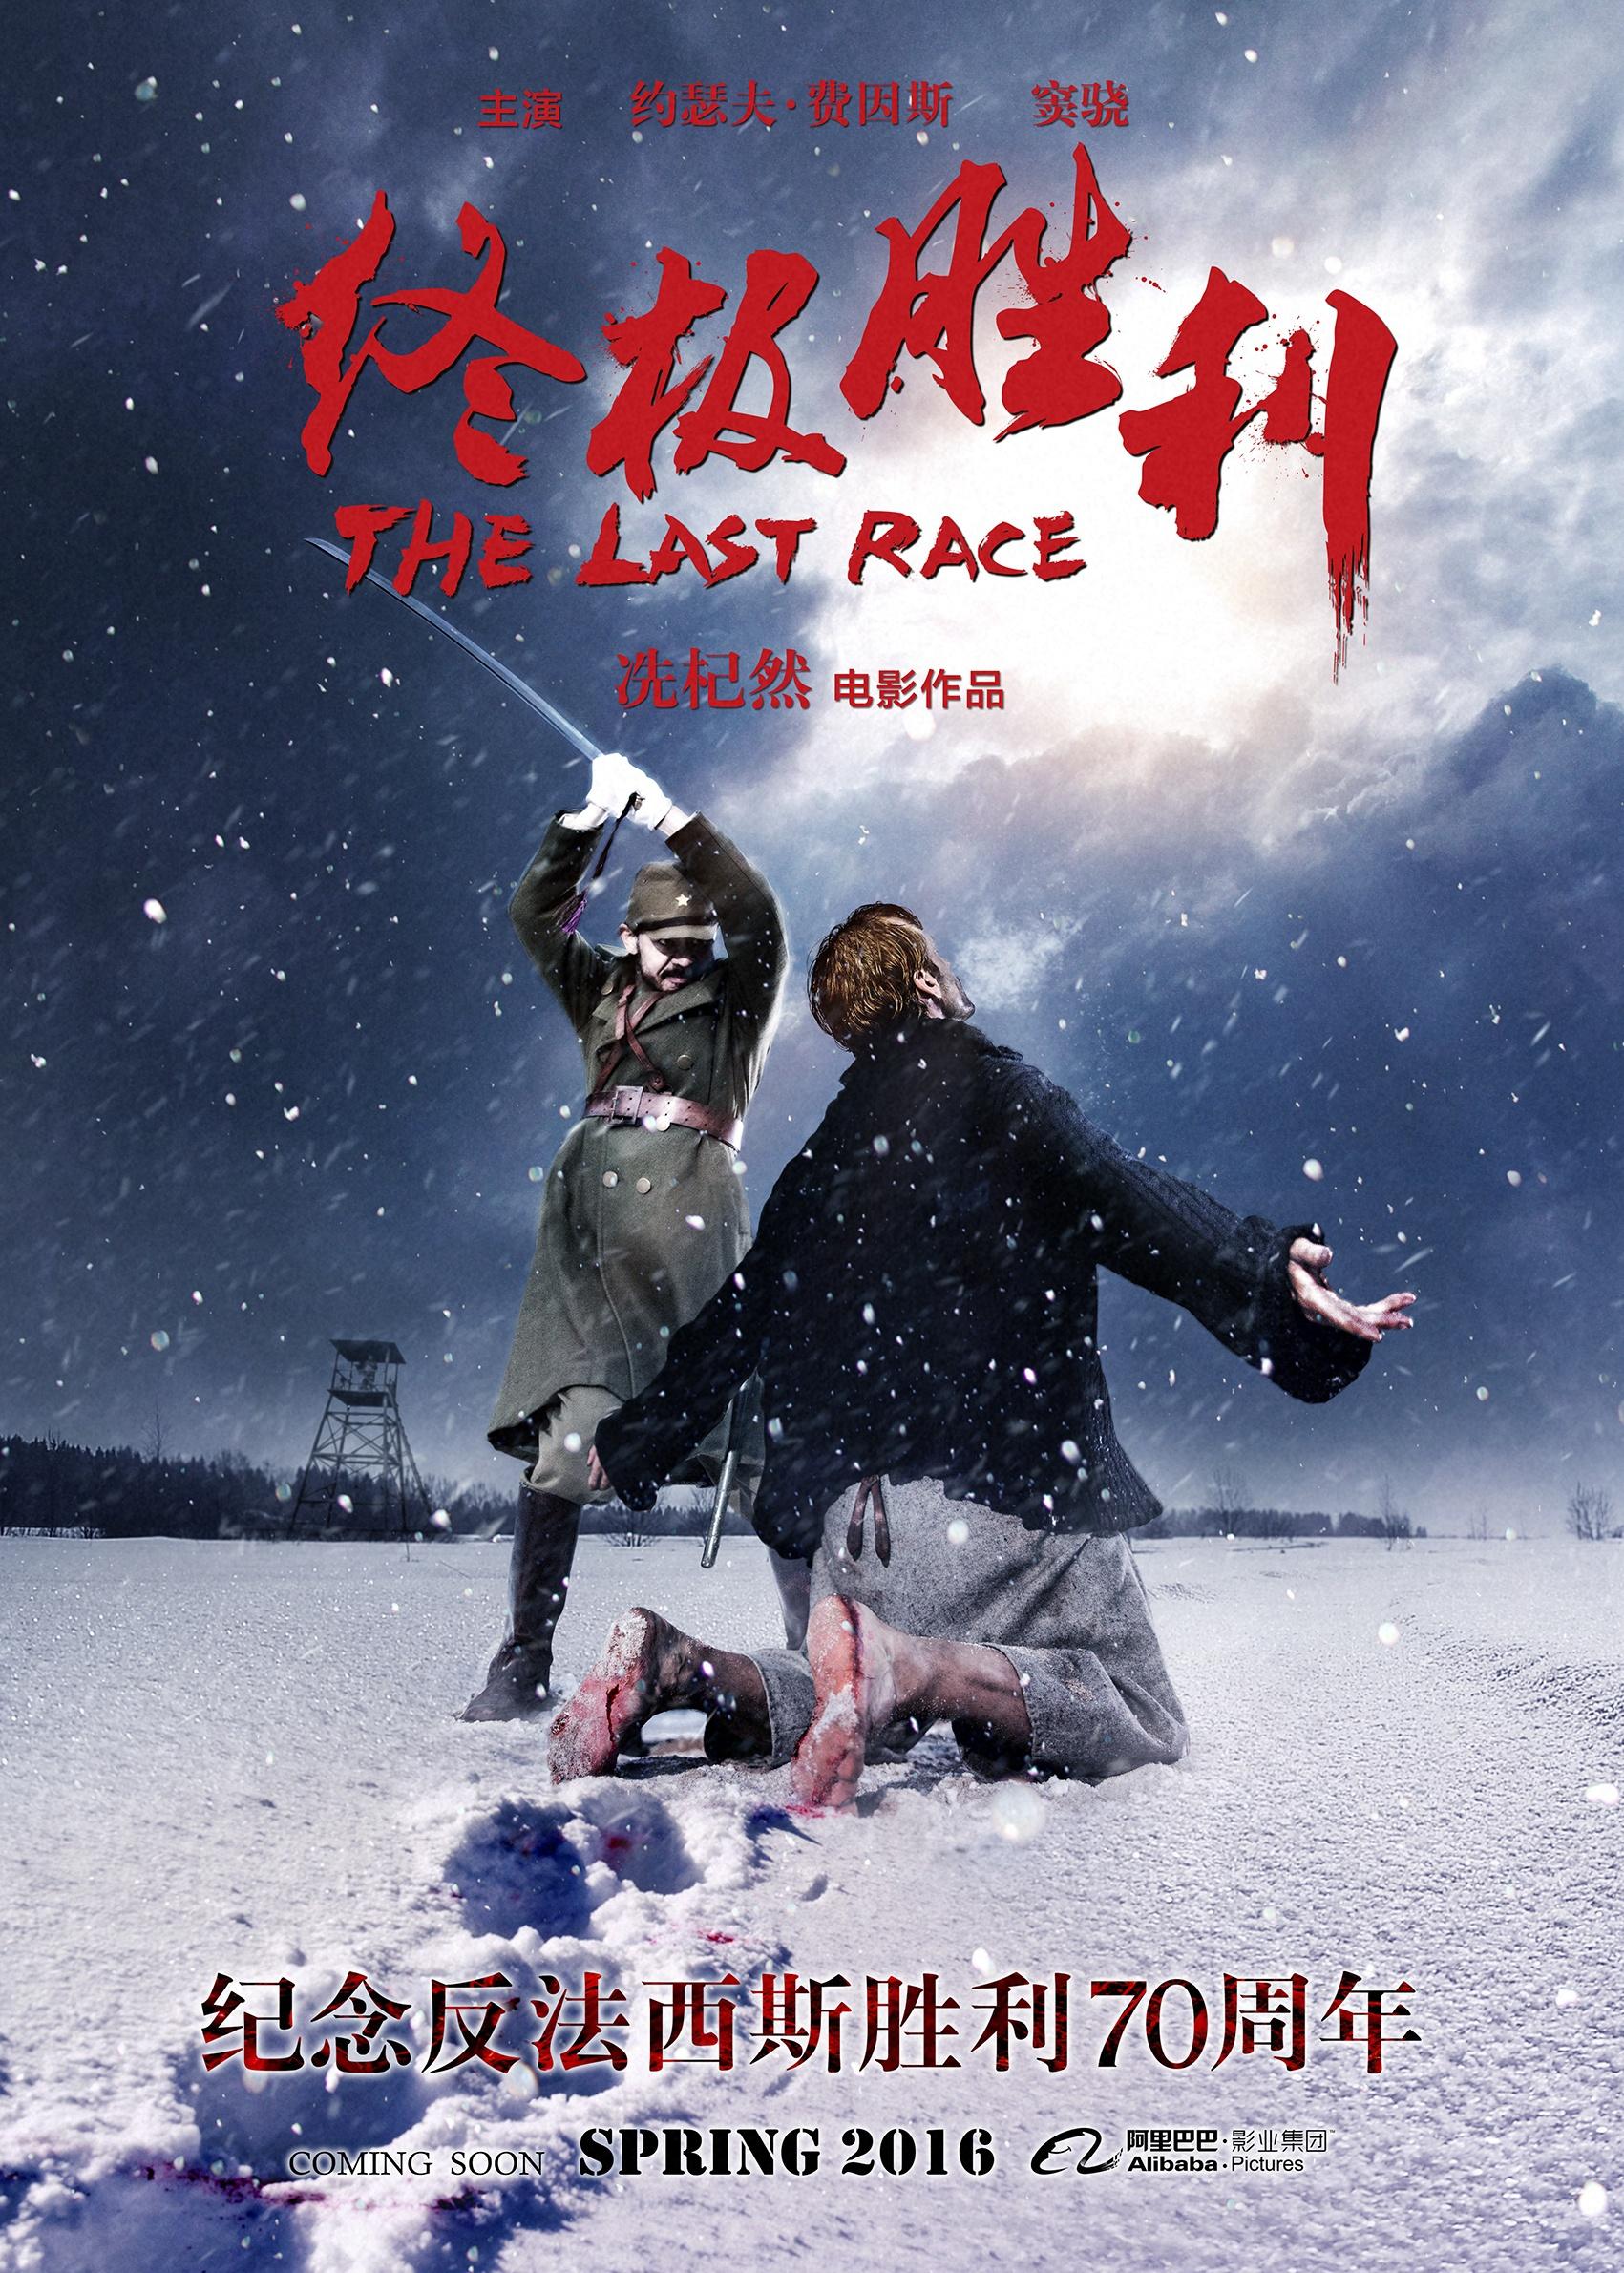 The Last Race (2015)